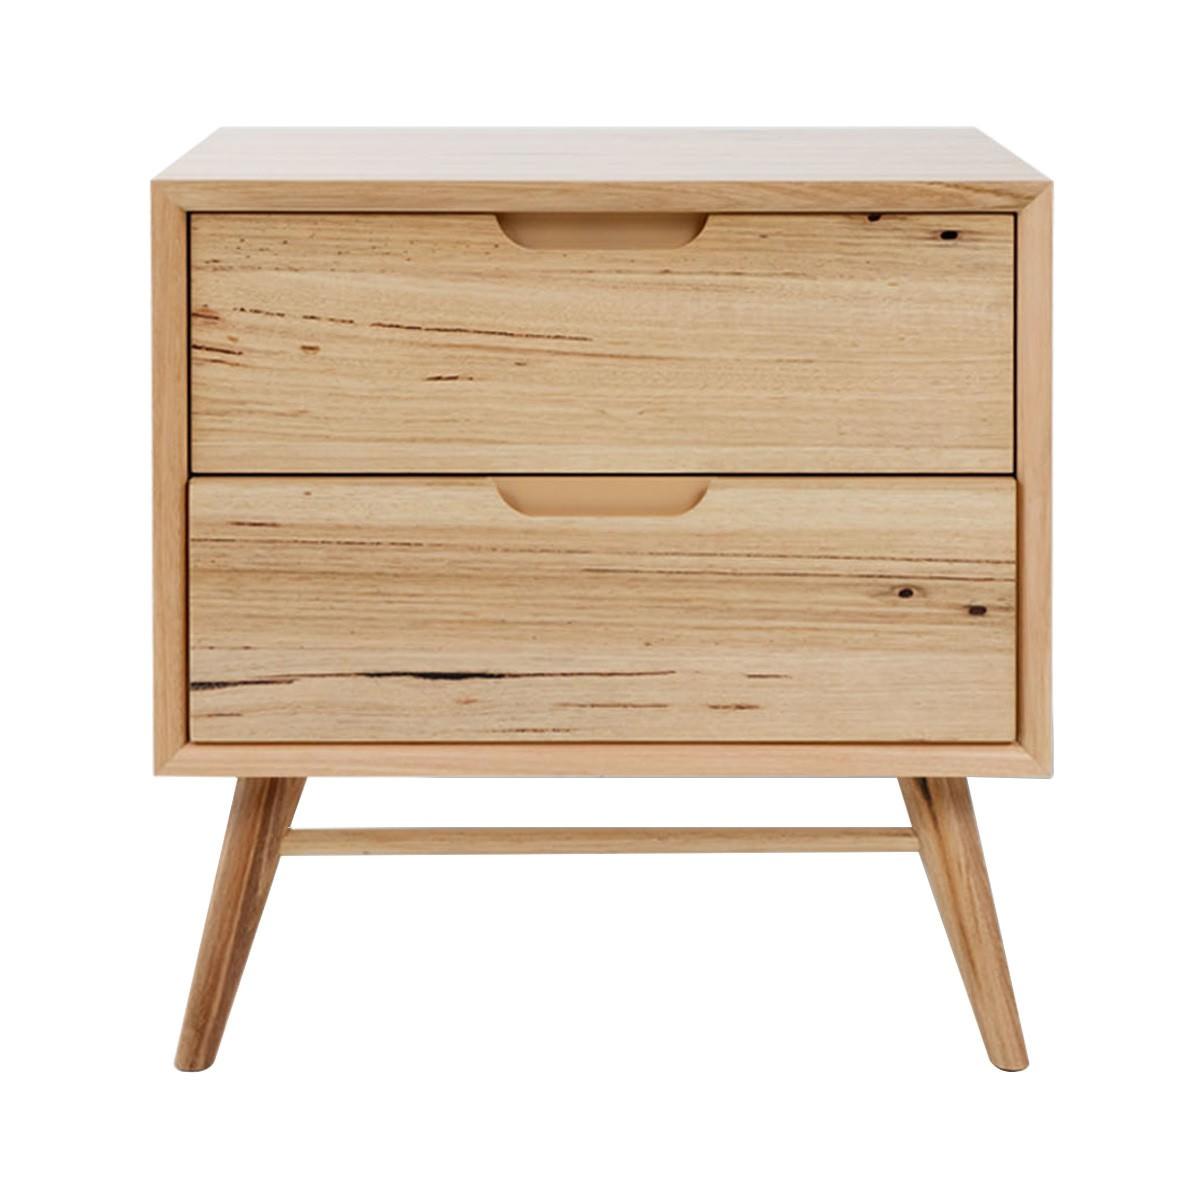 Marley Messmate Timber Bedside Table